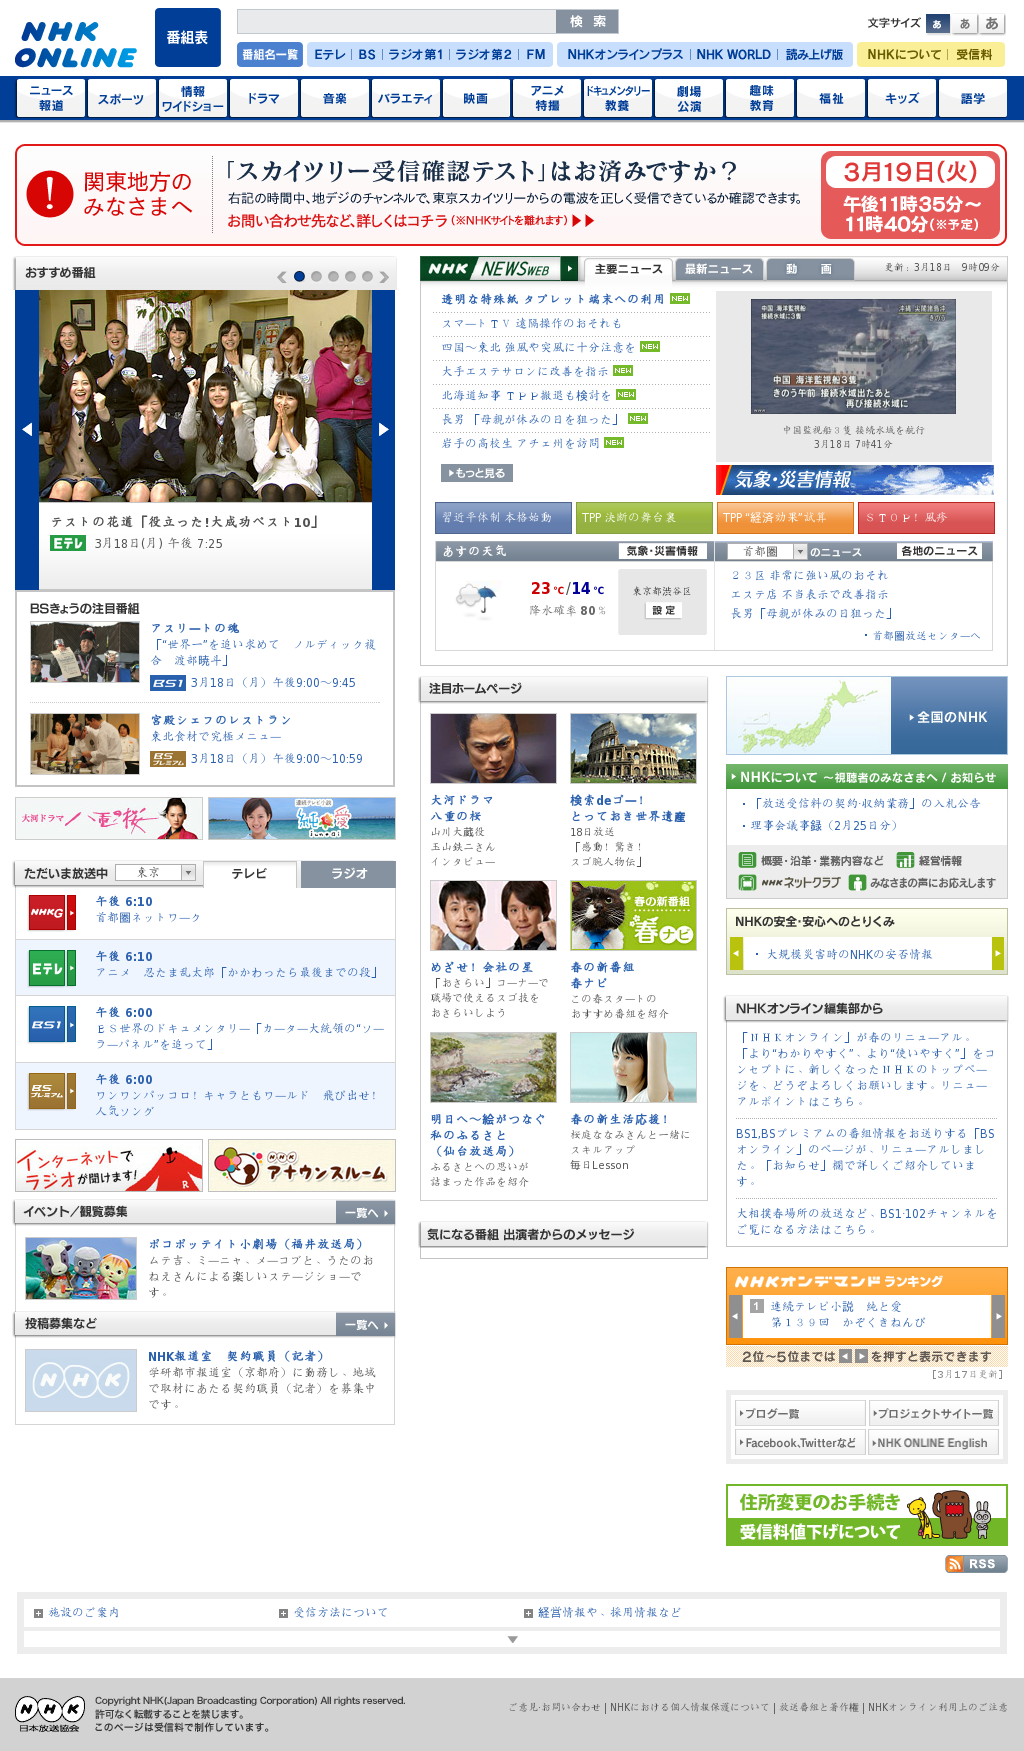 NHK Online at Monday March 18, 2013, 9:16 a.m. UTC